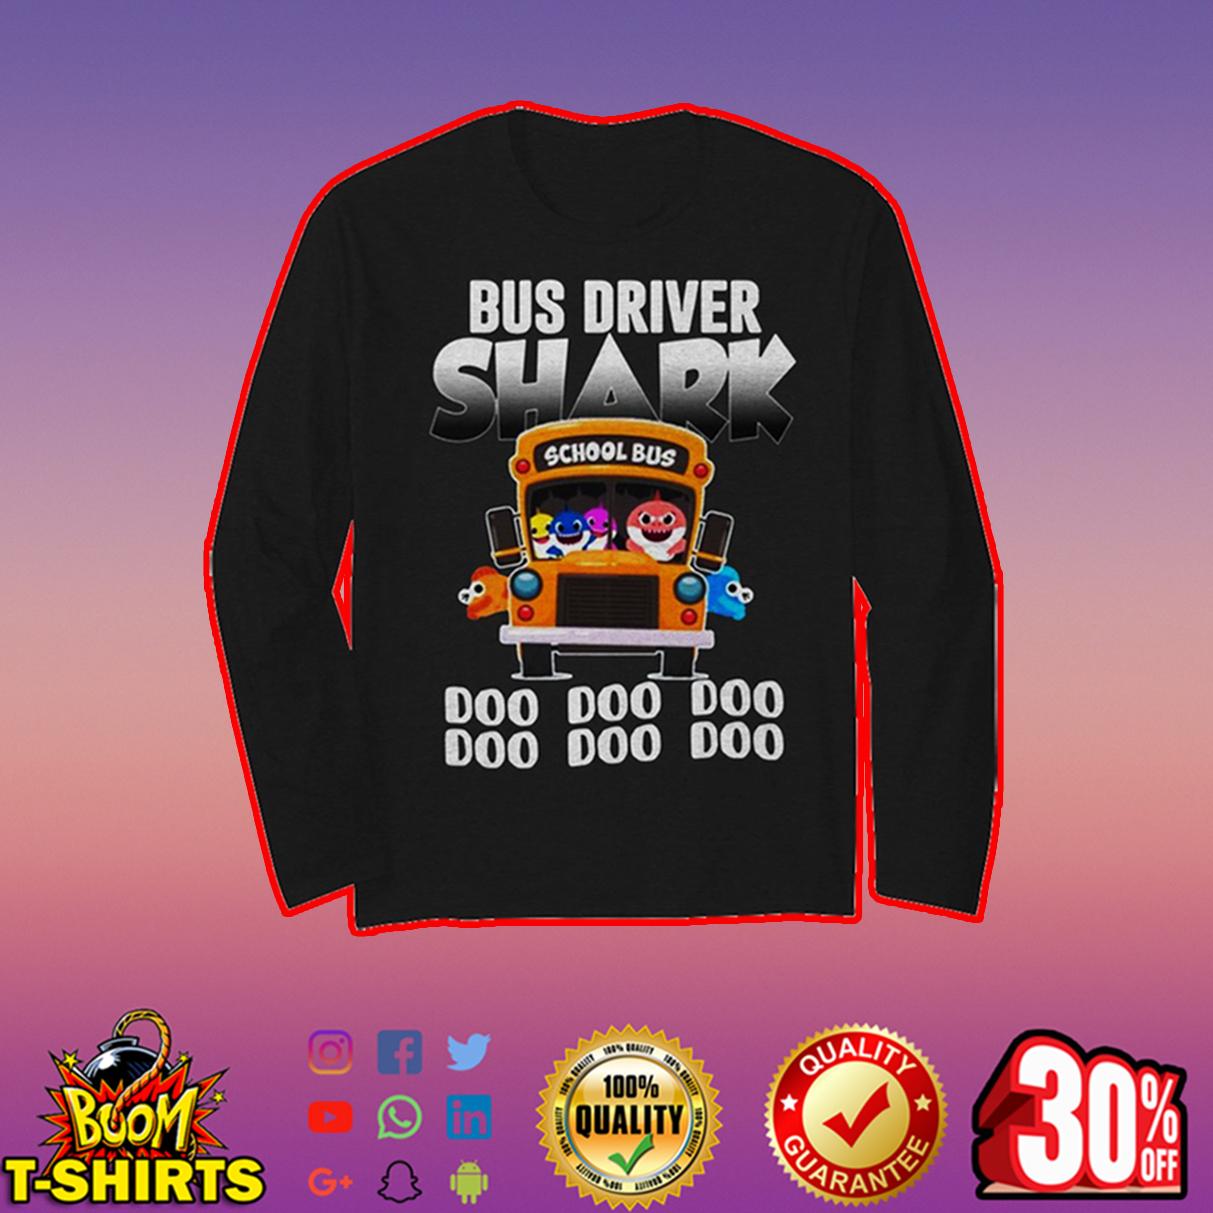 Bus driver shark doo doo doo long sleeve t-shirt